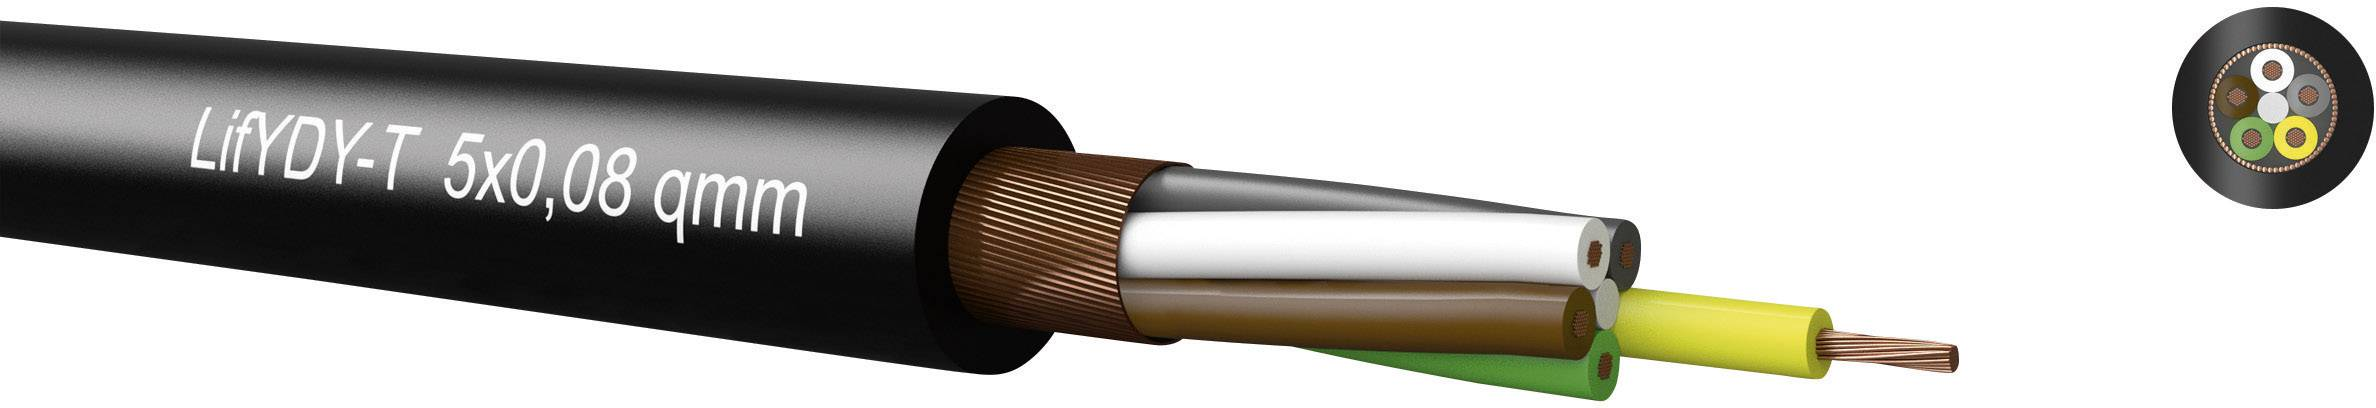 Riadiaci kábel Kabeltronik LifYDY 350500800, 5 x 0.08 mm², vonkajší Ø 3.80 mm, 300 V, metrový tovar, čierna